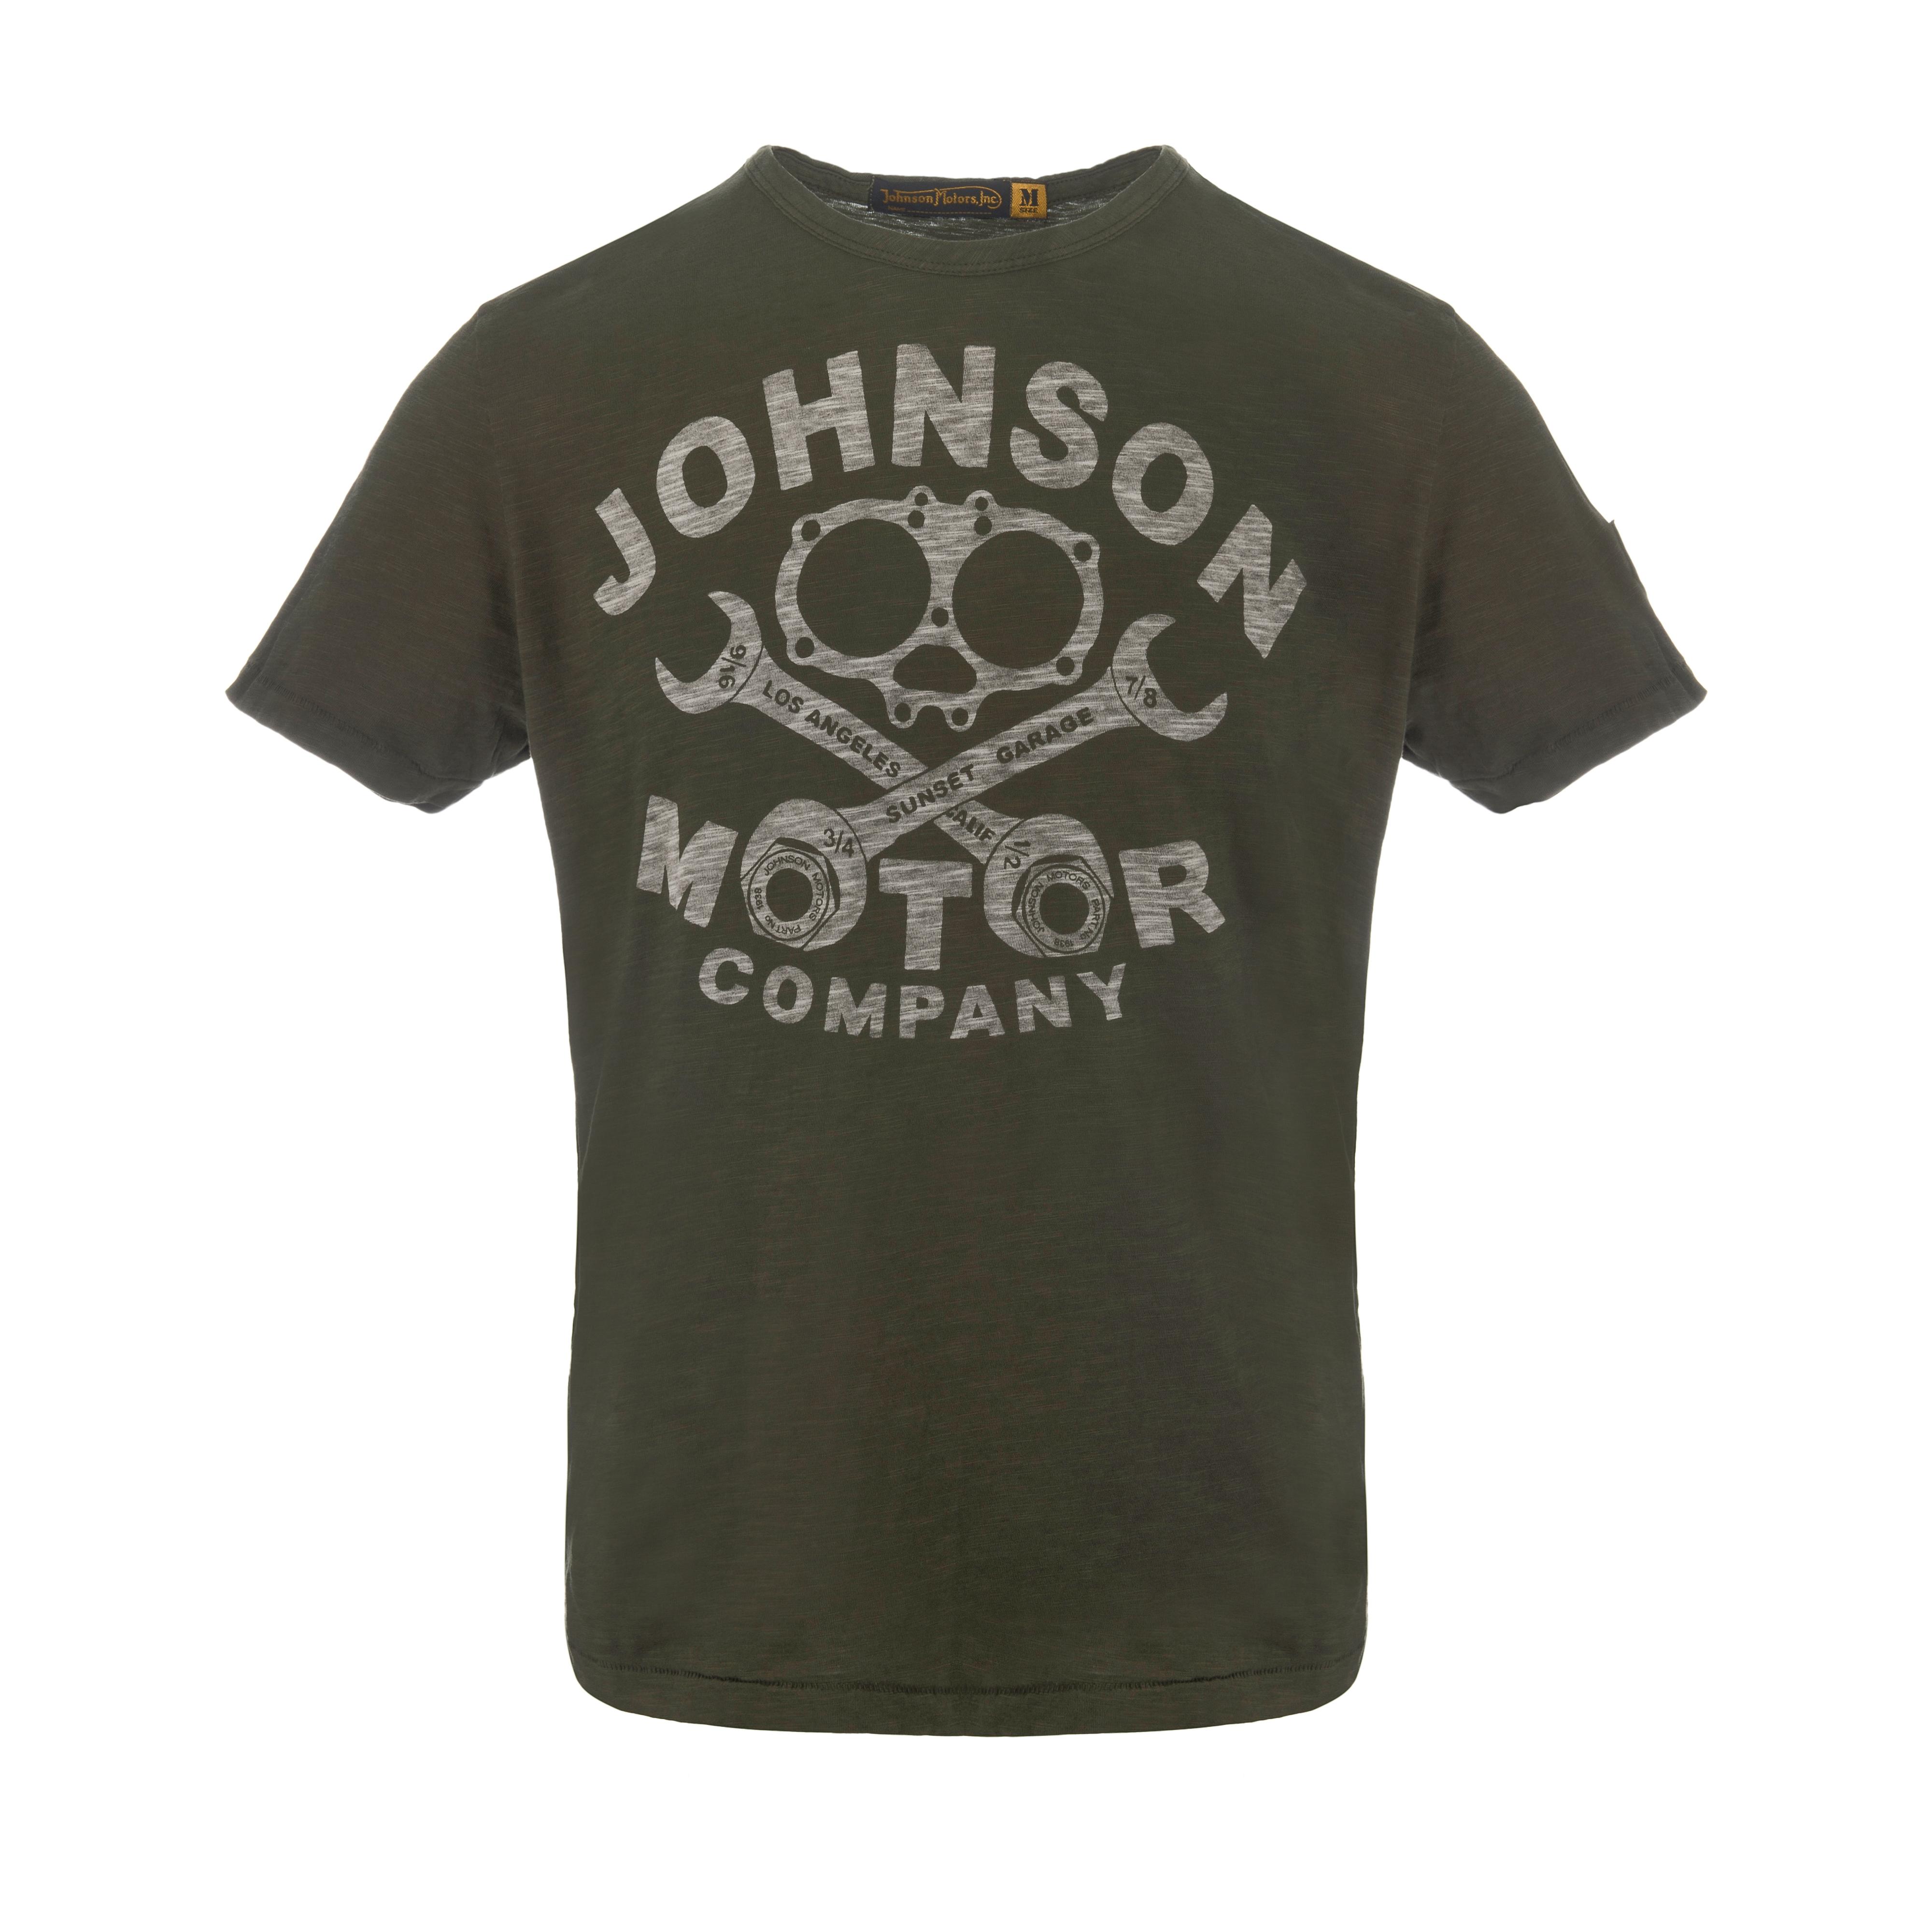 Johnston Motors Impremedia Net